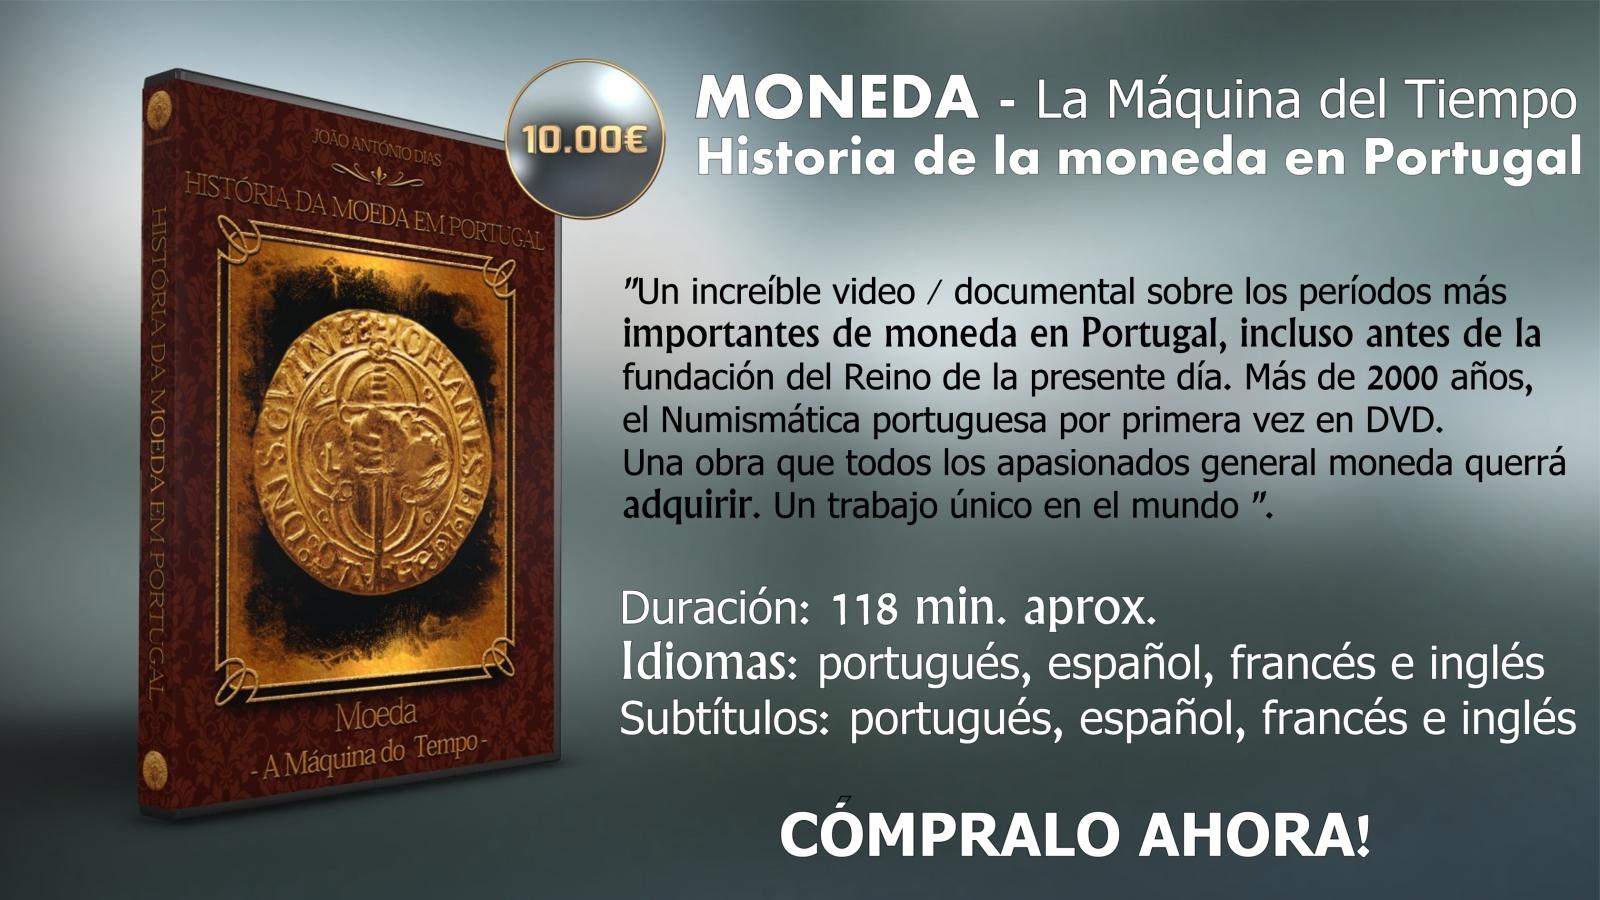 YA DISPONIBLE EL DVD HISTORIA DE LA MONEDA EN PORTUGAL 2jam87t